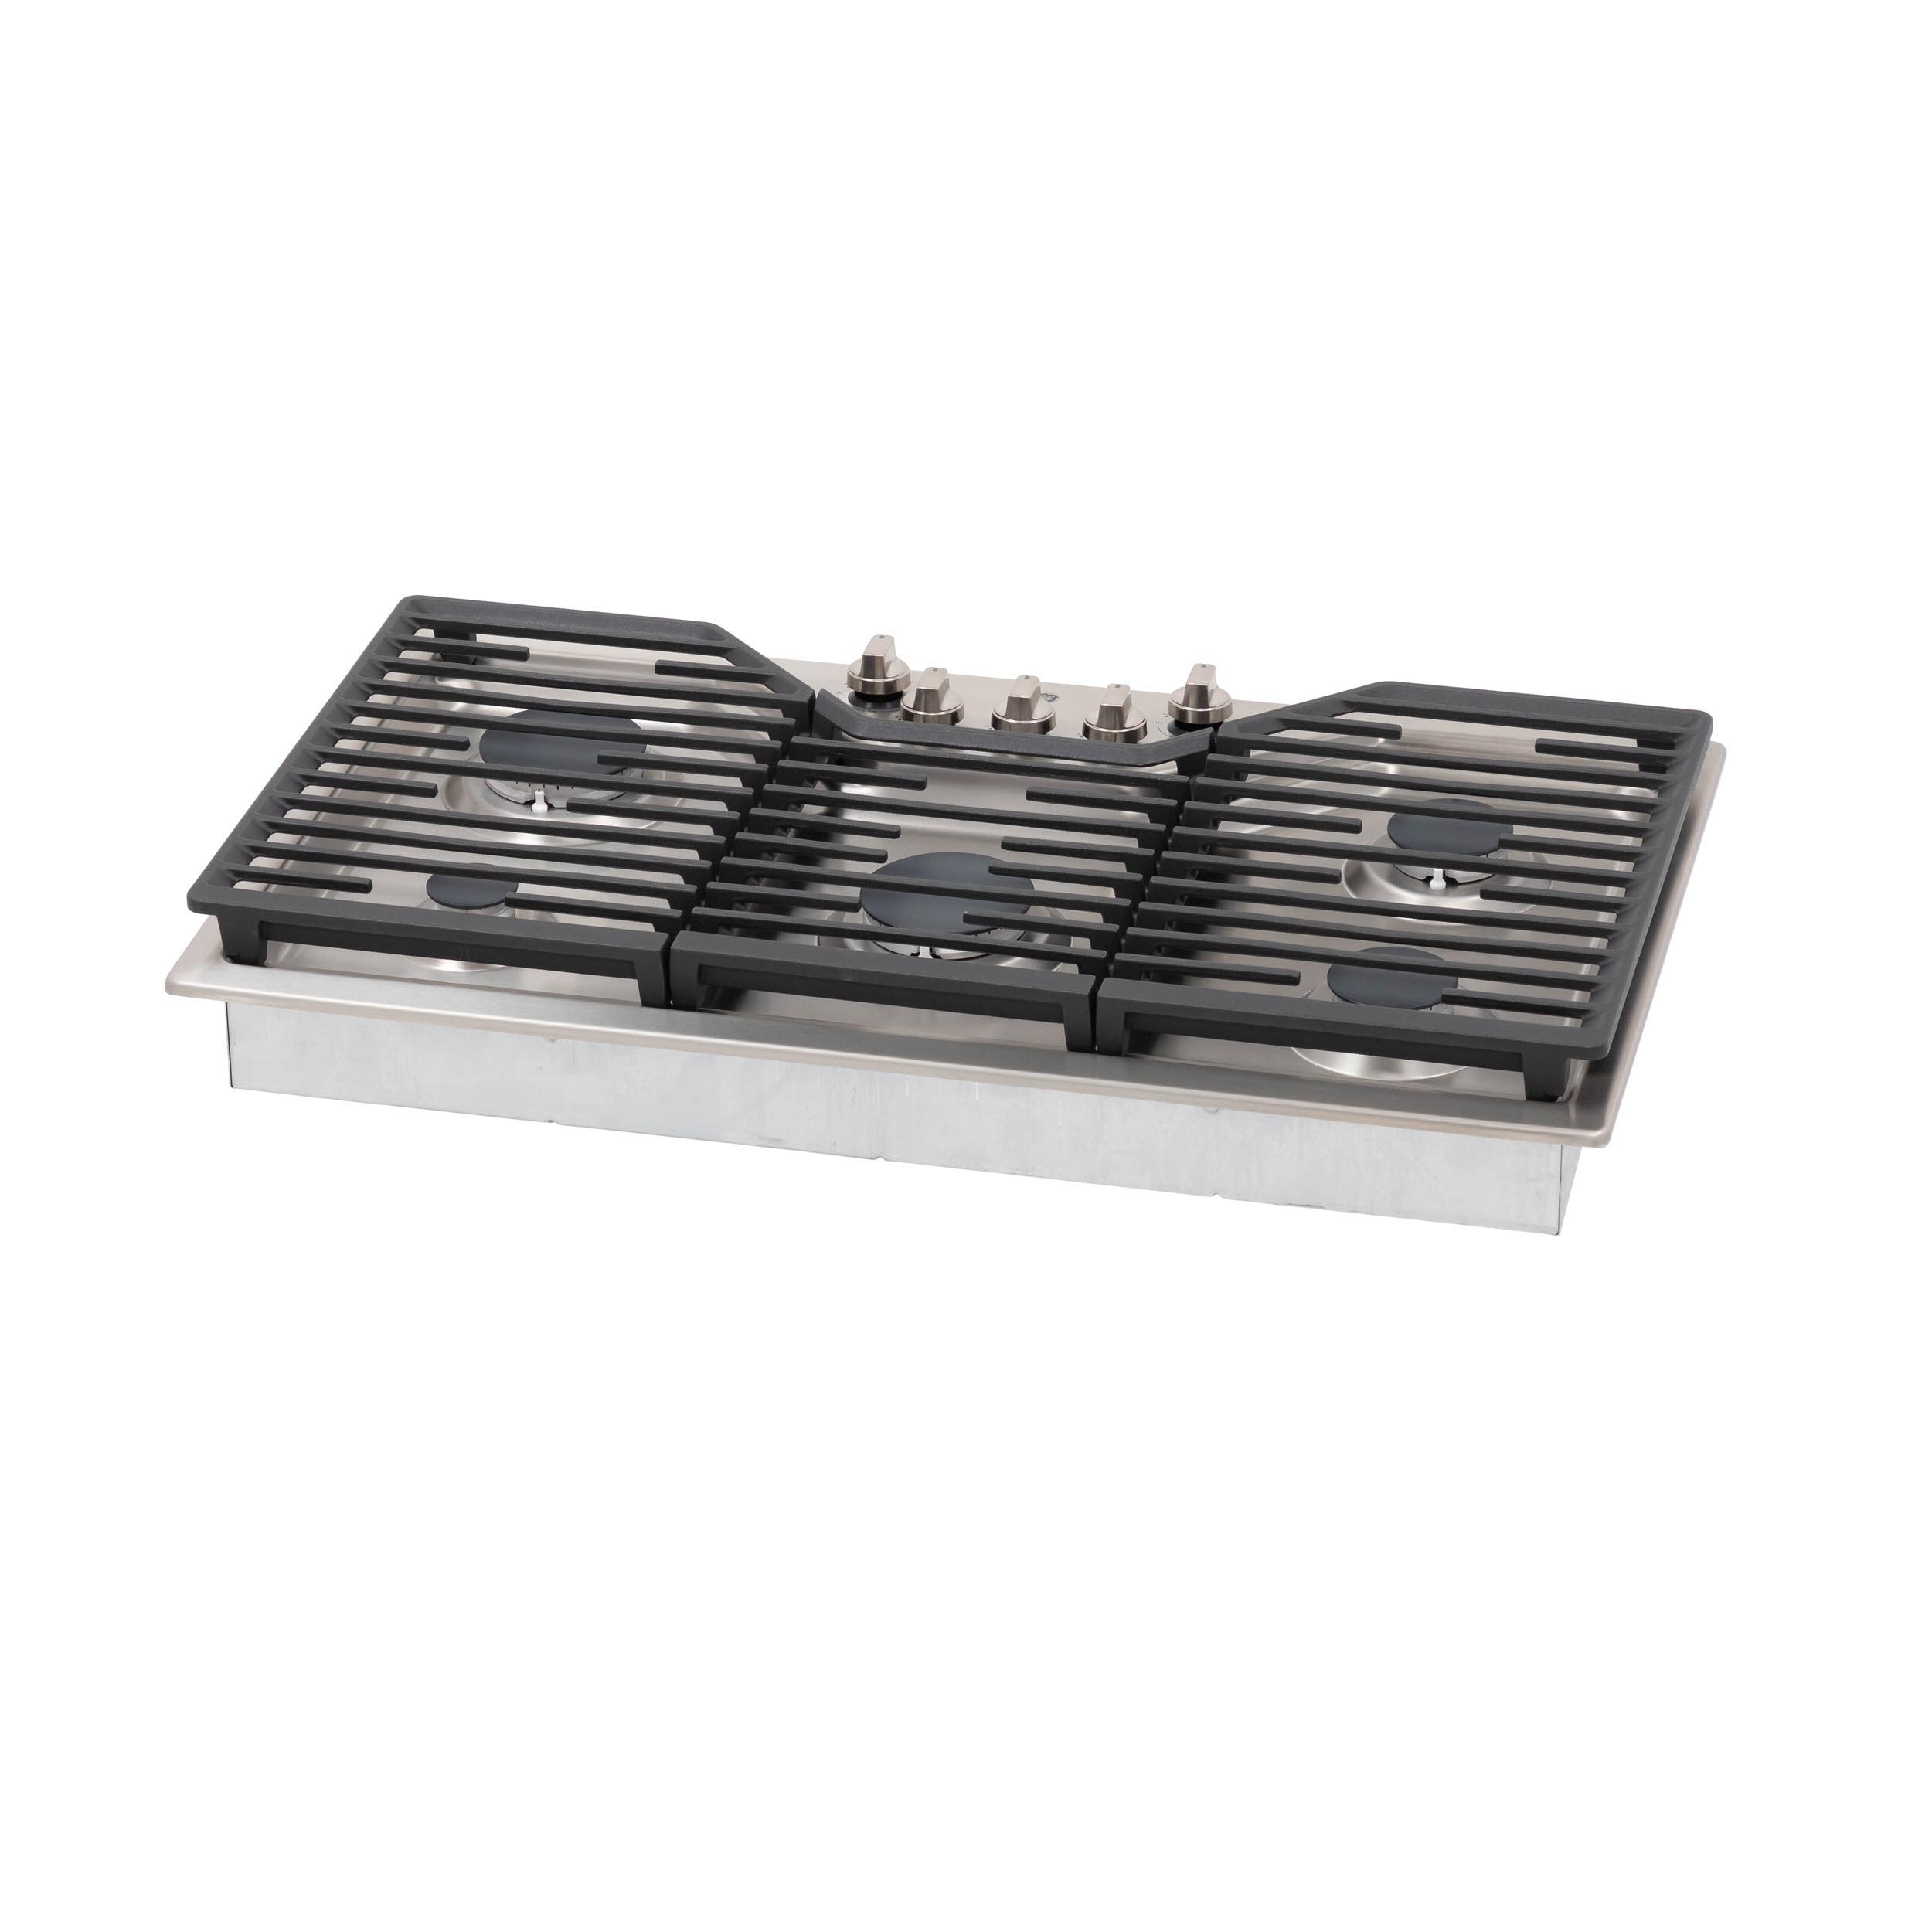 "Model: JGP5036SLSS | GE GE® 36"" Built-In Gas Cooktop with 5 Burners and Dishwasher Safe Grates"